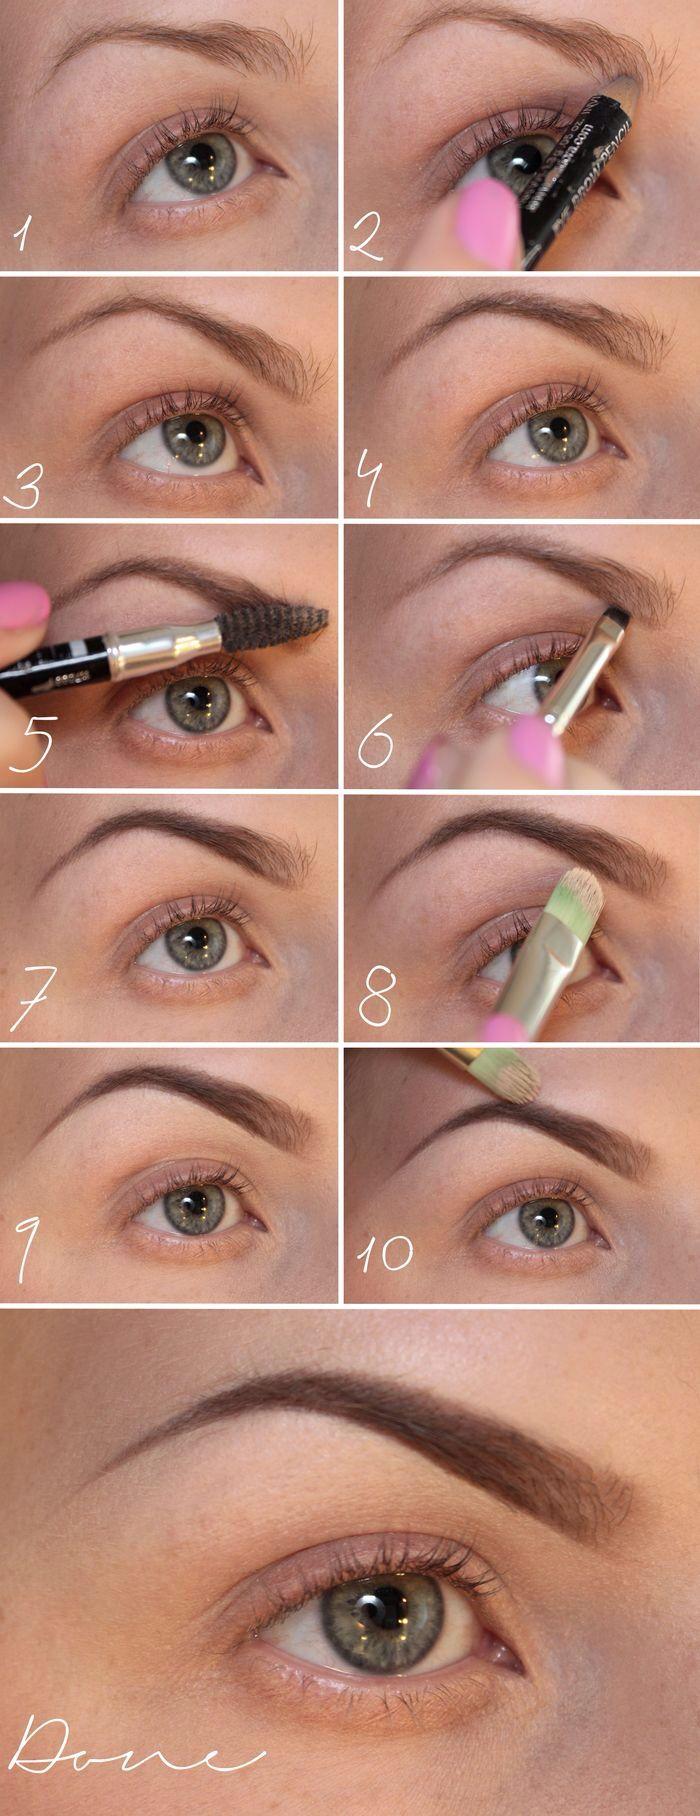 Eye brow shaping